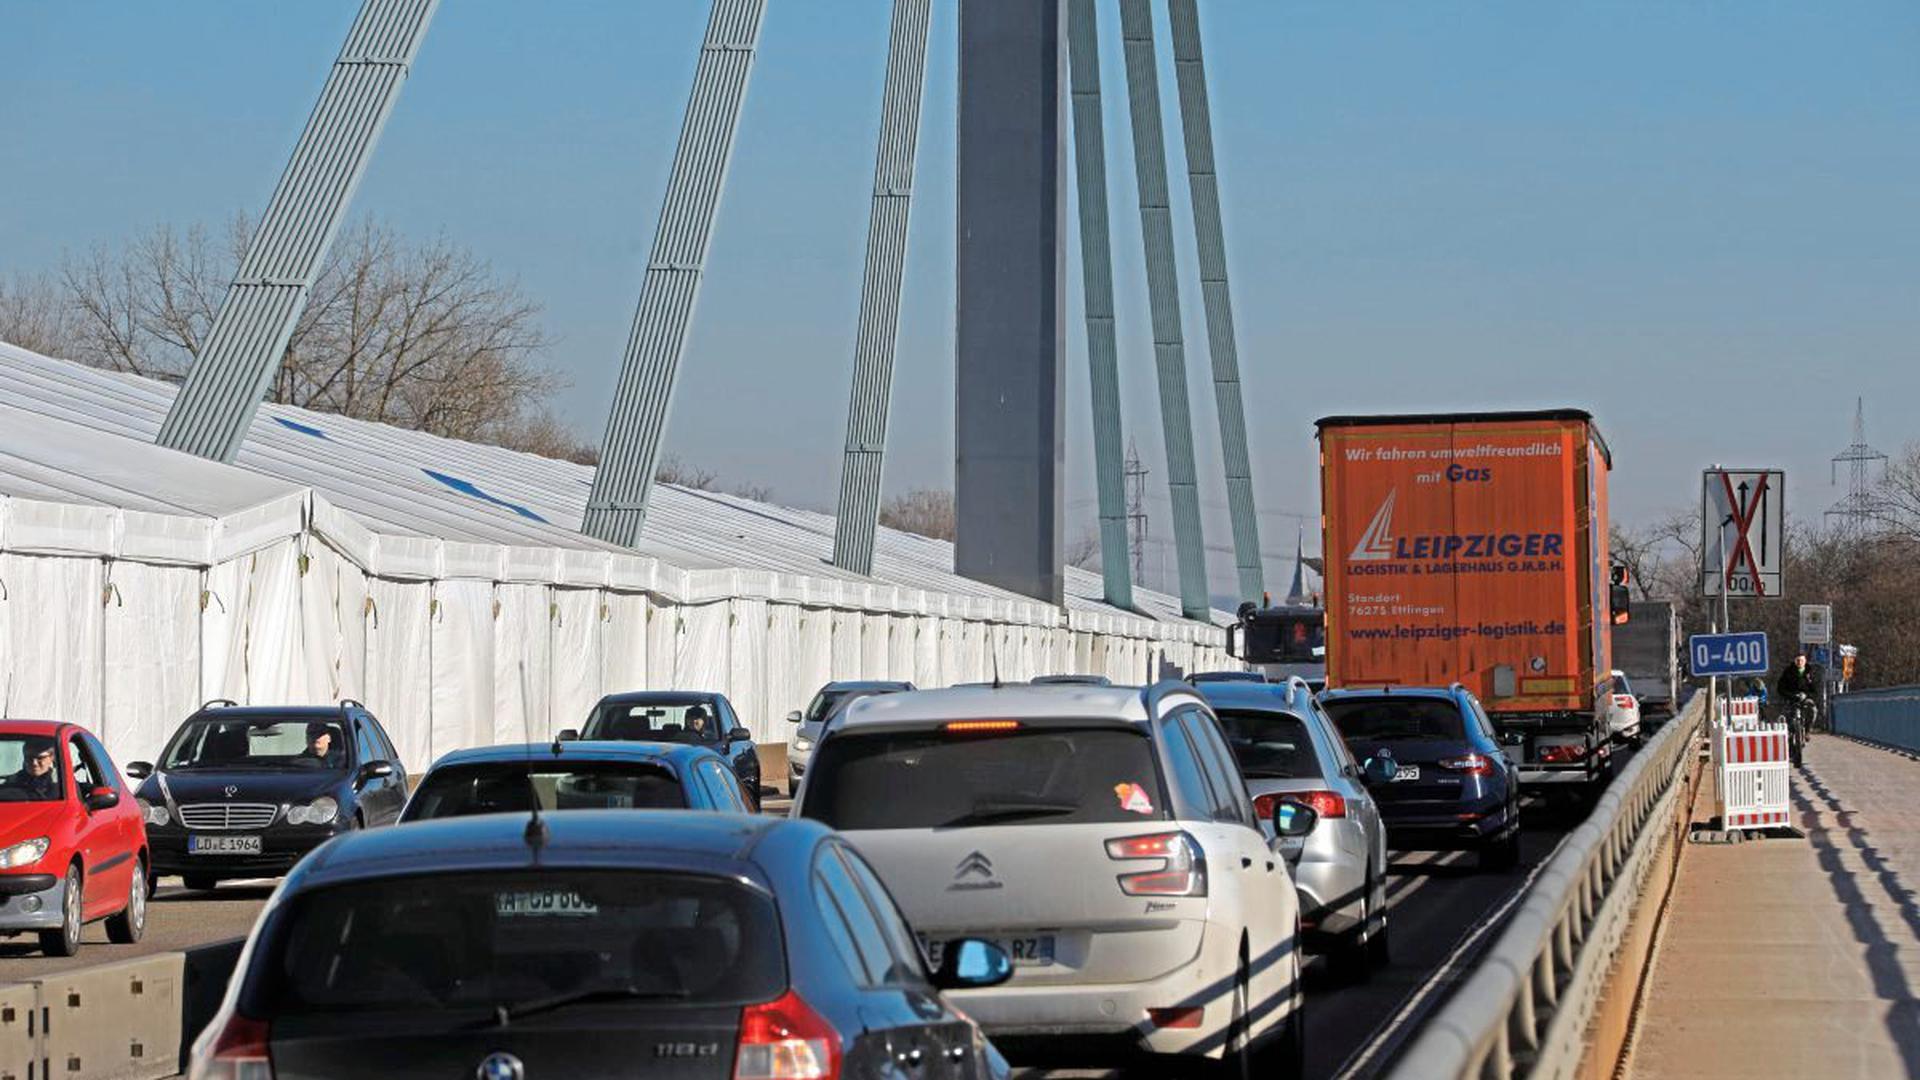 Baustelle Rheinbrücke Karlsruhe 2021